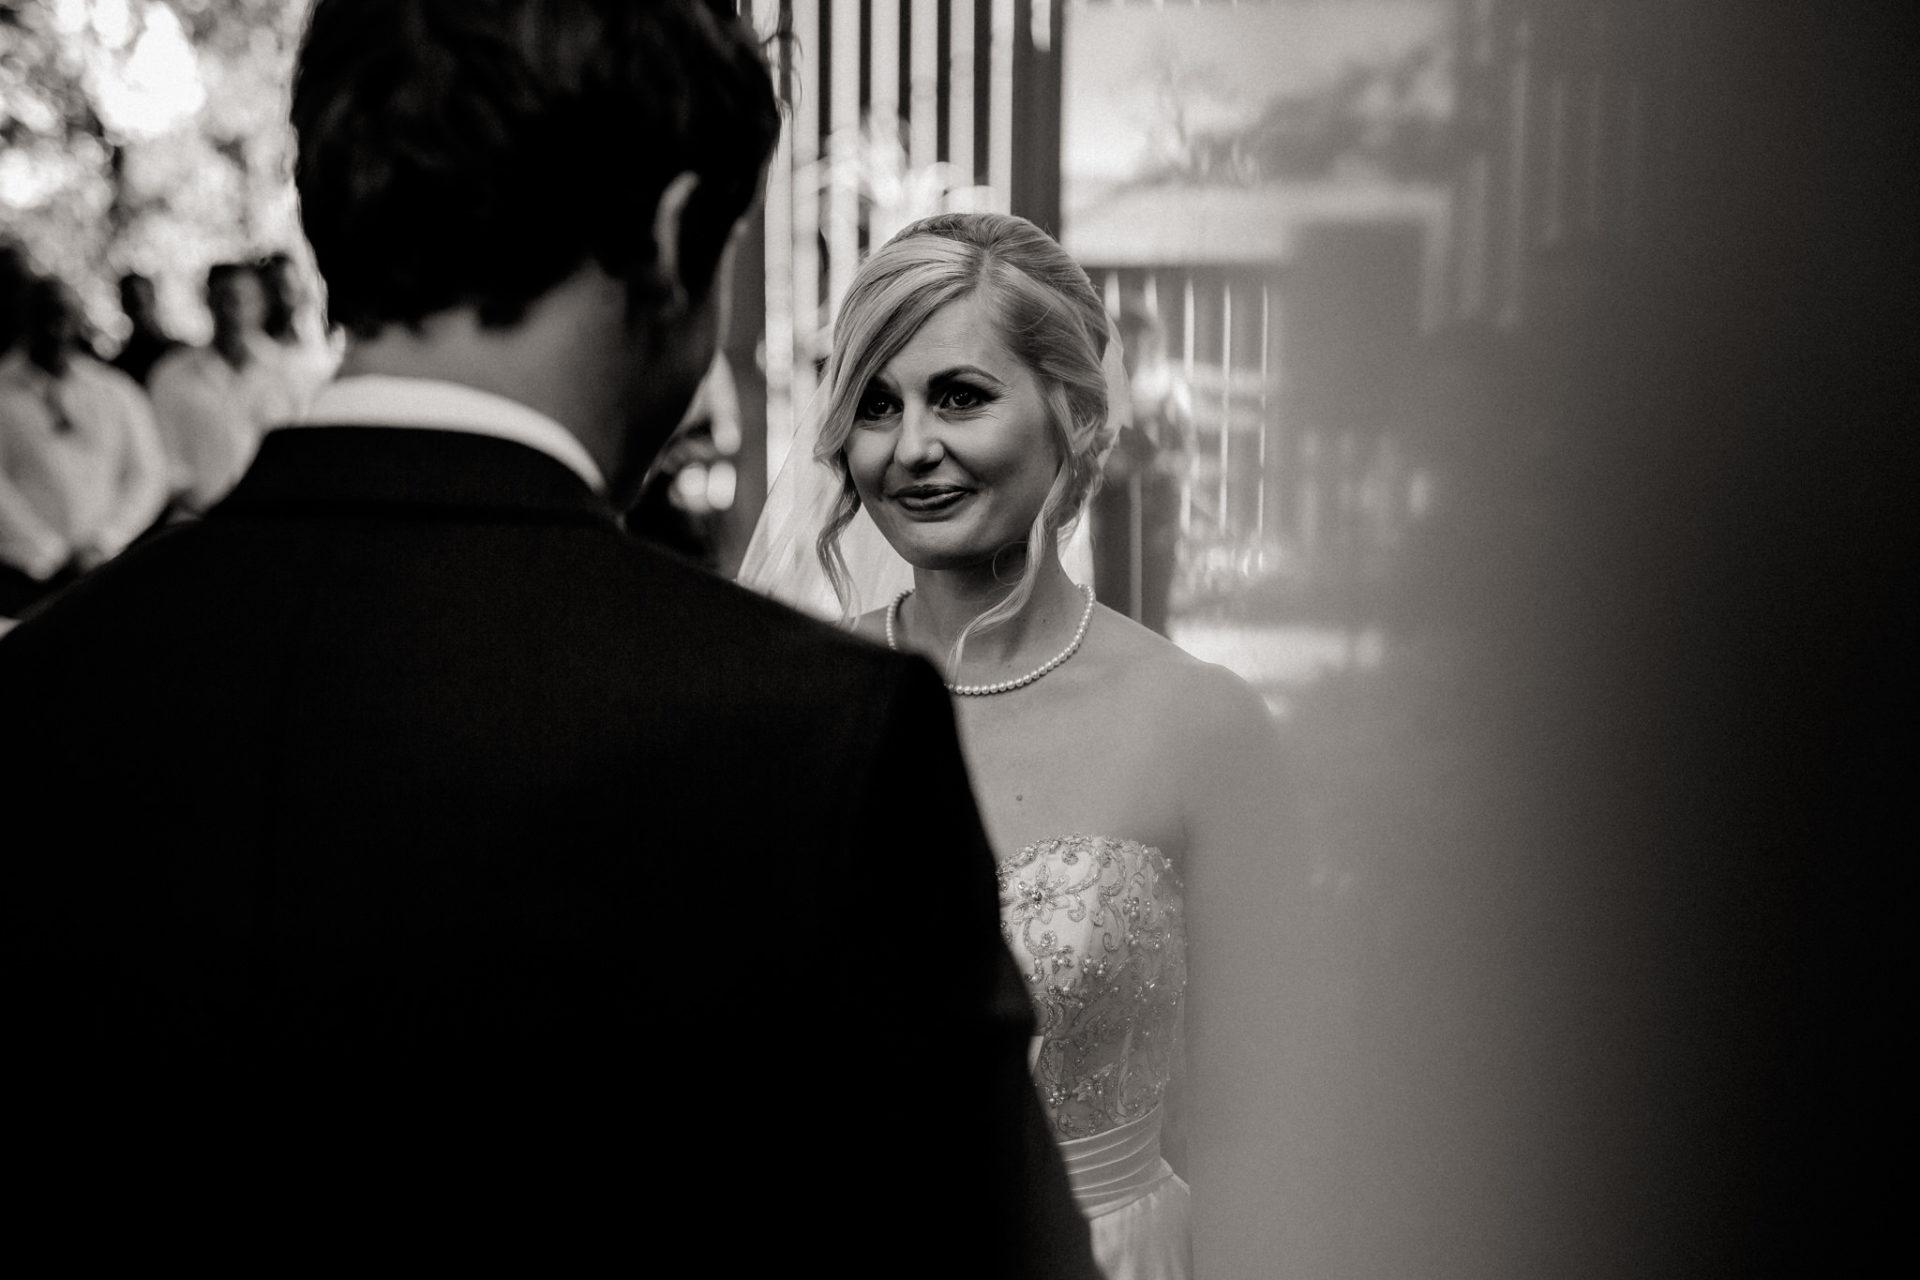 backyard-wedding-australia-melbourne-ceremony-first-look